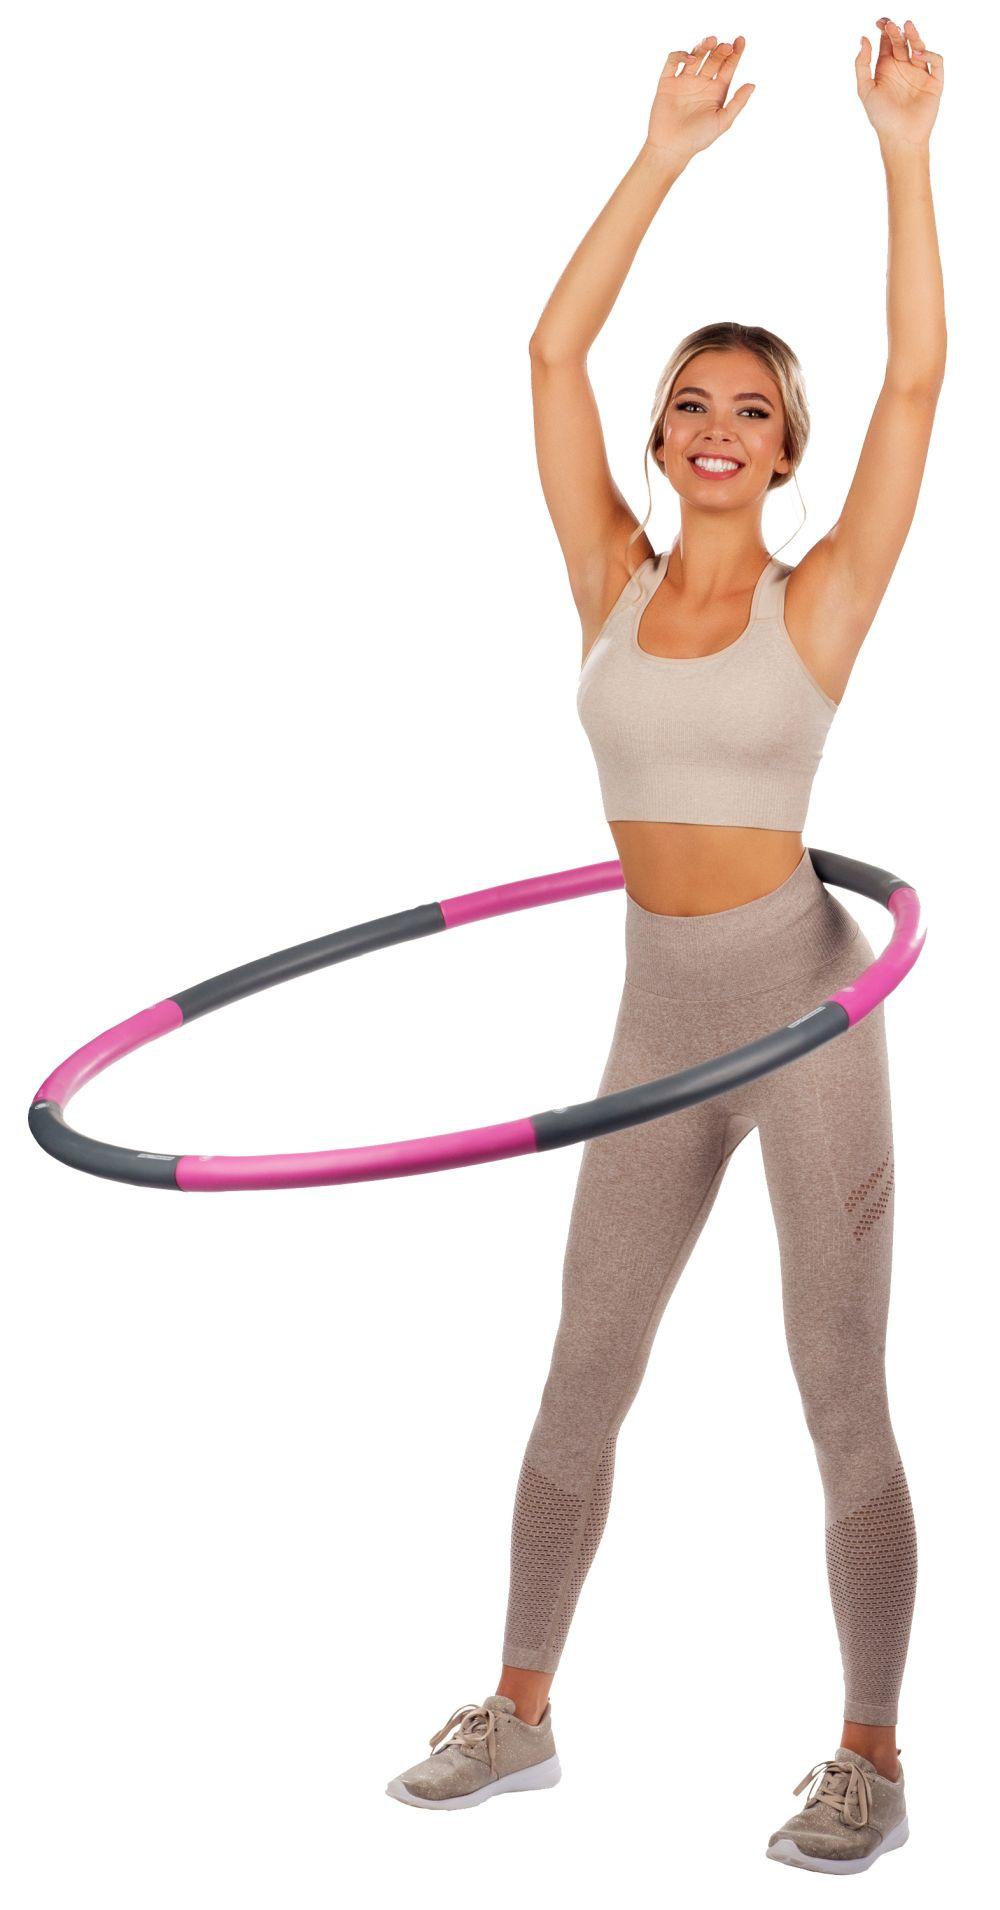 PEARL sports Hula-Hoop-Reifen mit Schaumstoff-Ummantelung